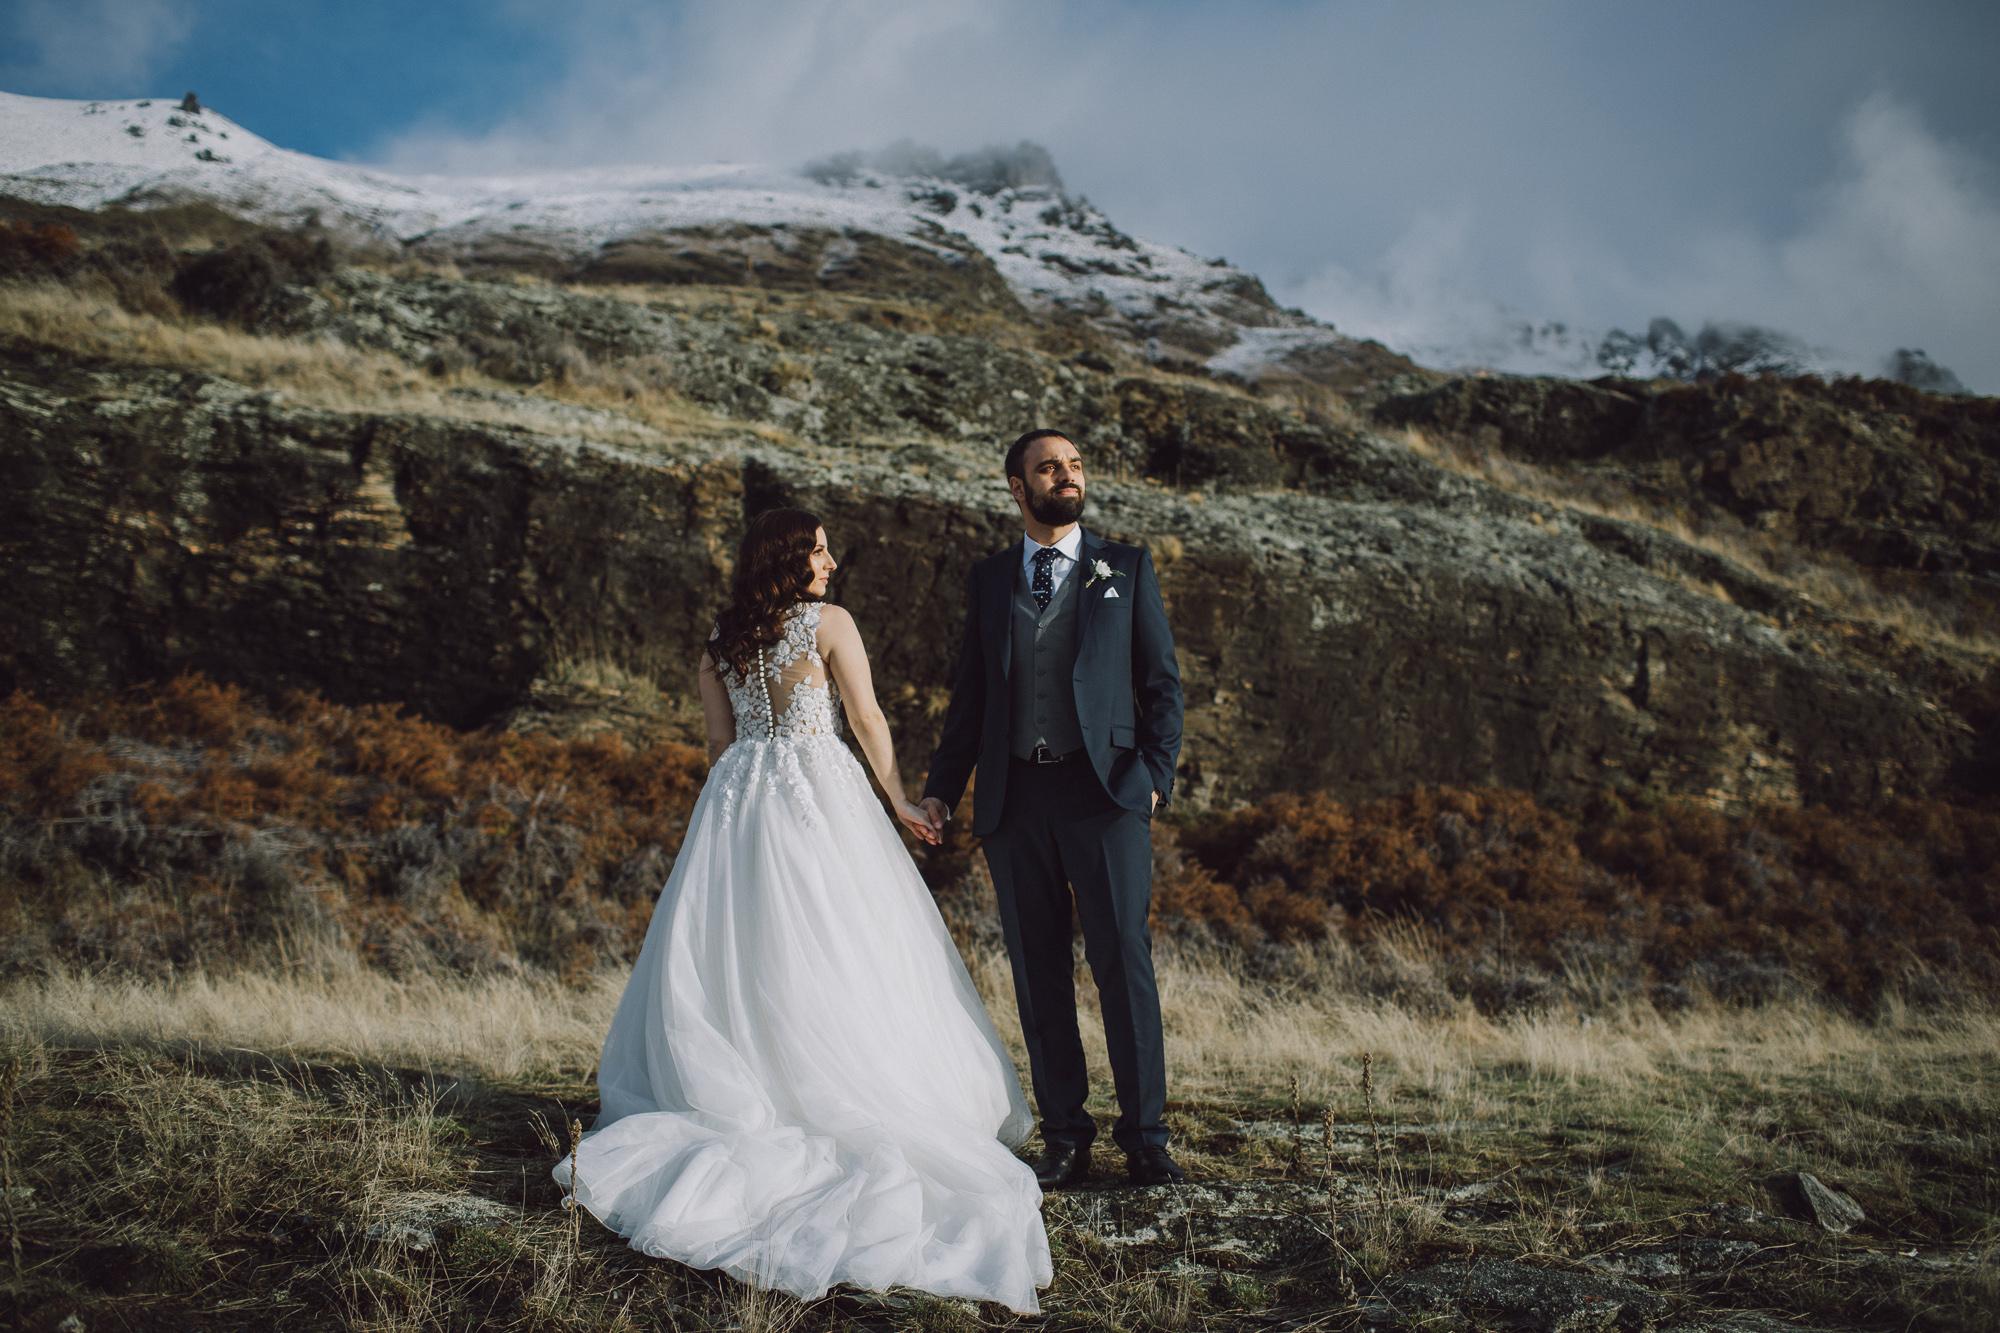 Queenstown Cecil Peak Heli Wedding